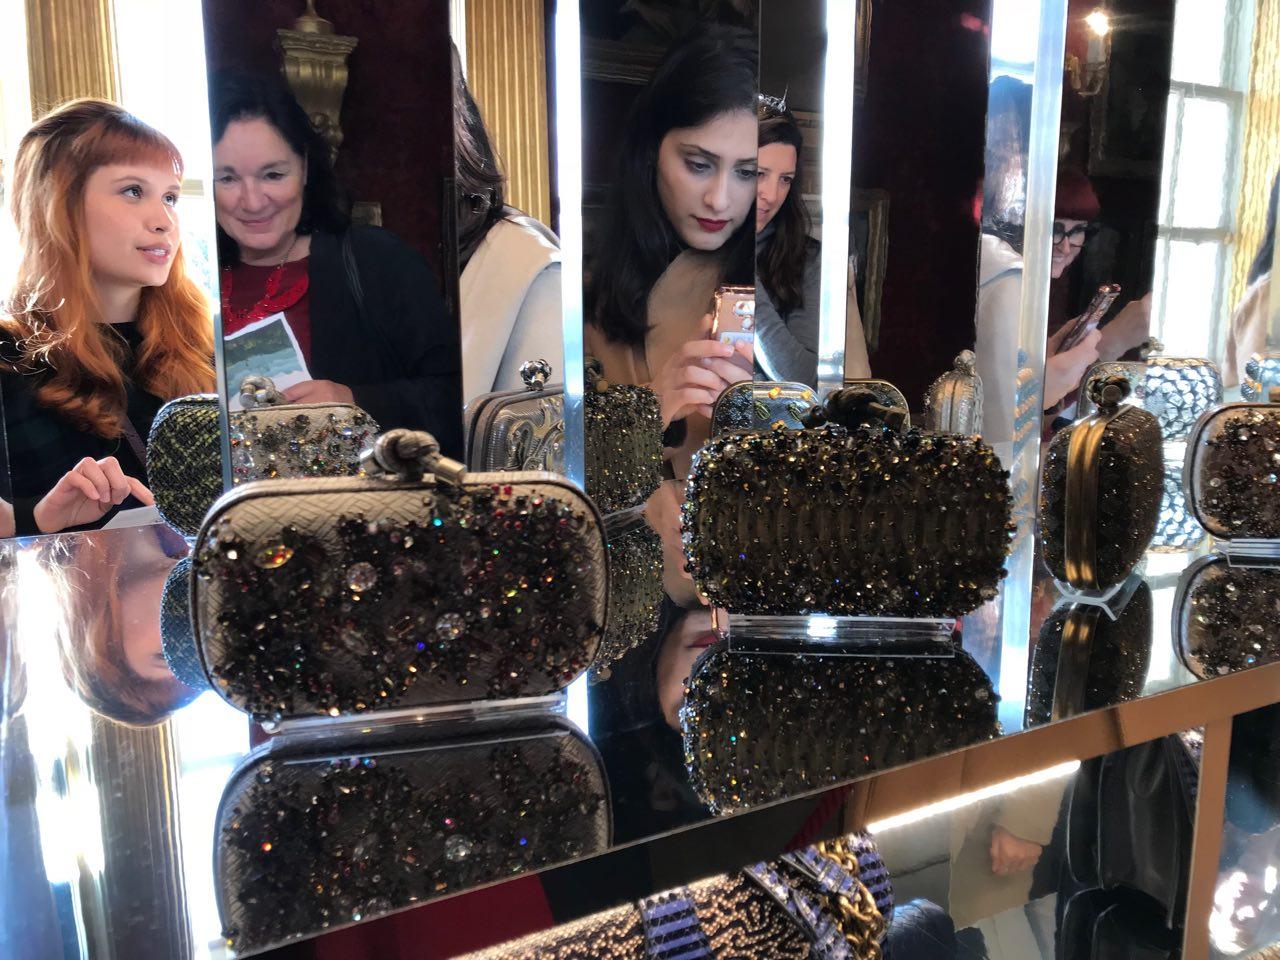 Bottega Veneta clutch bags displayed like precious jewels